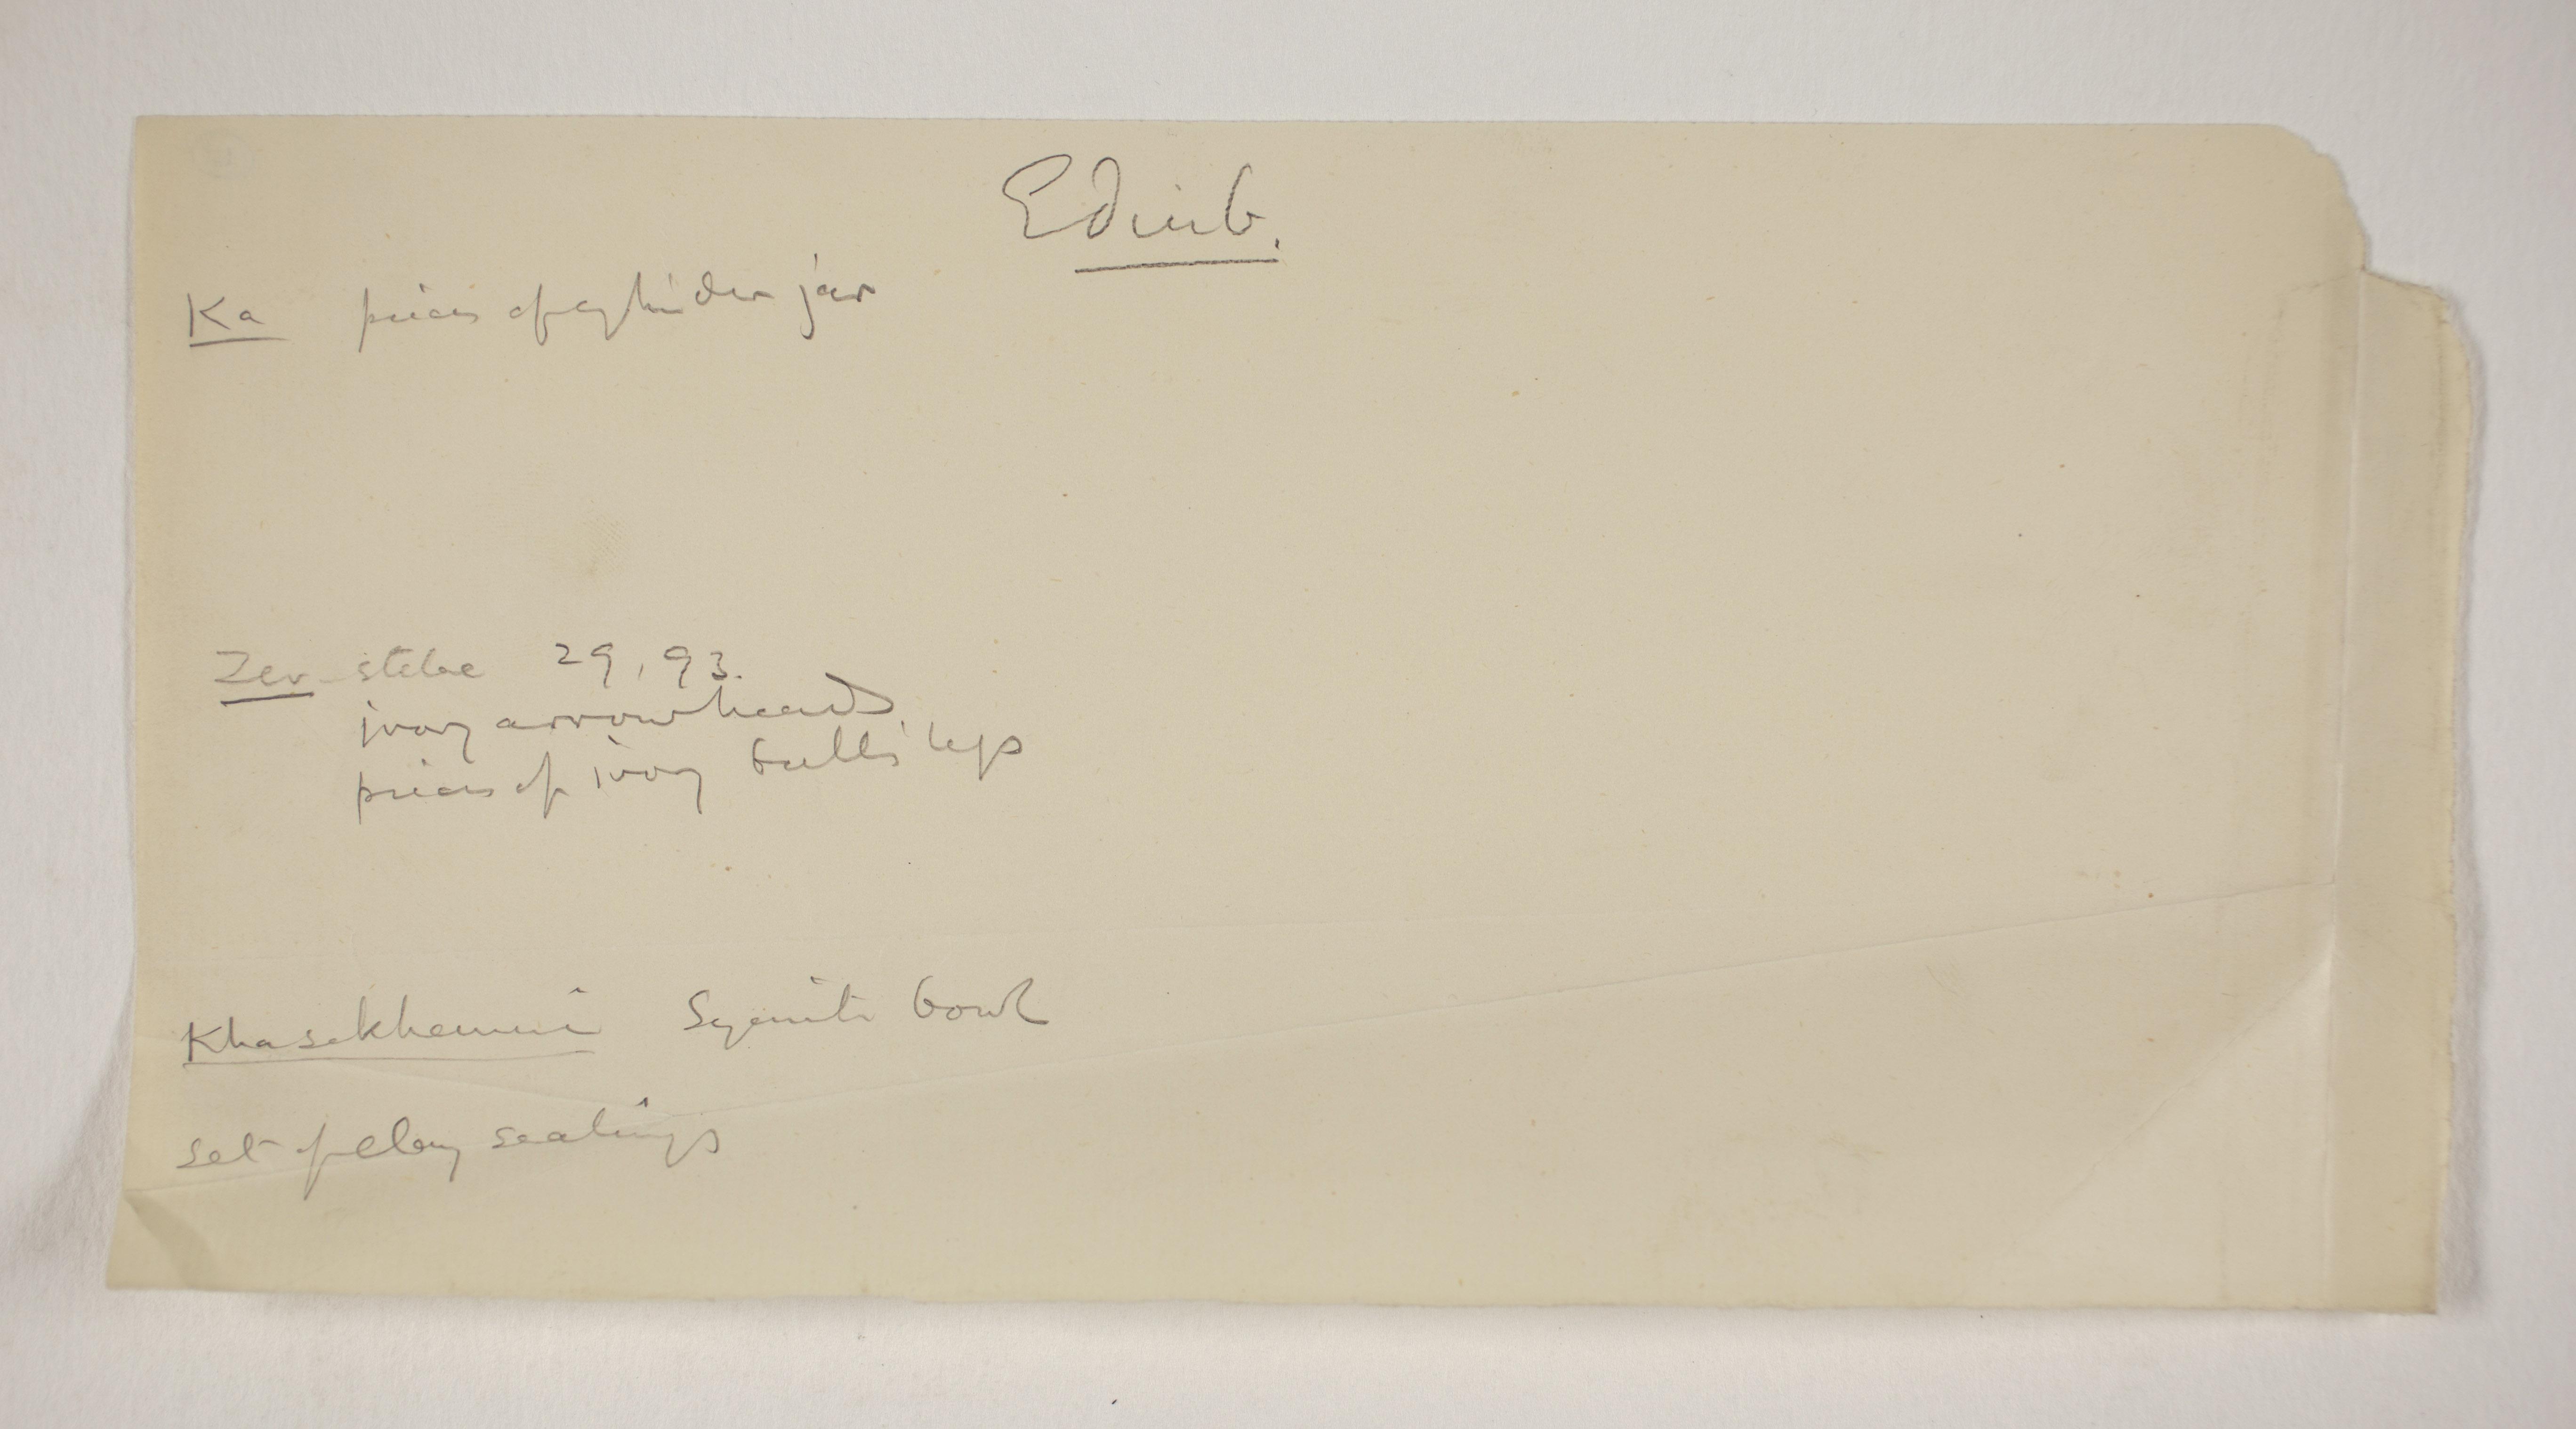 1900-01 Abydos, Bet Khallaf, el-Mahasna Individual institution list  PMA/WFP1/D/9/17